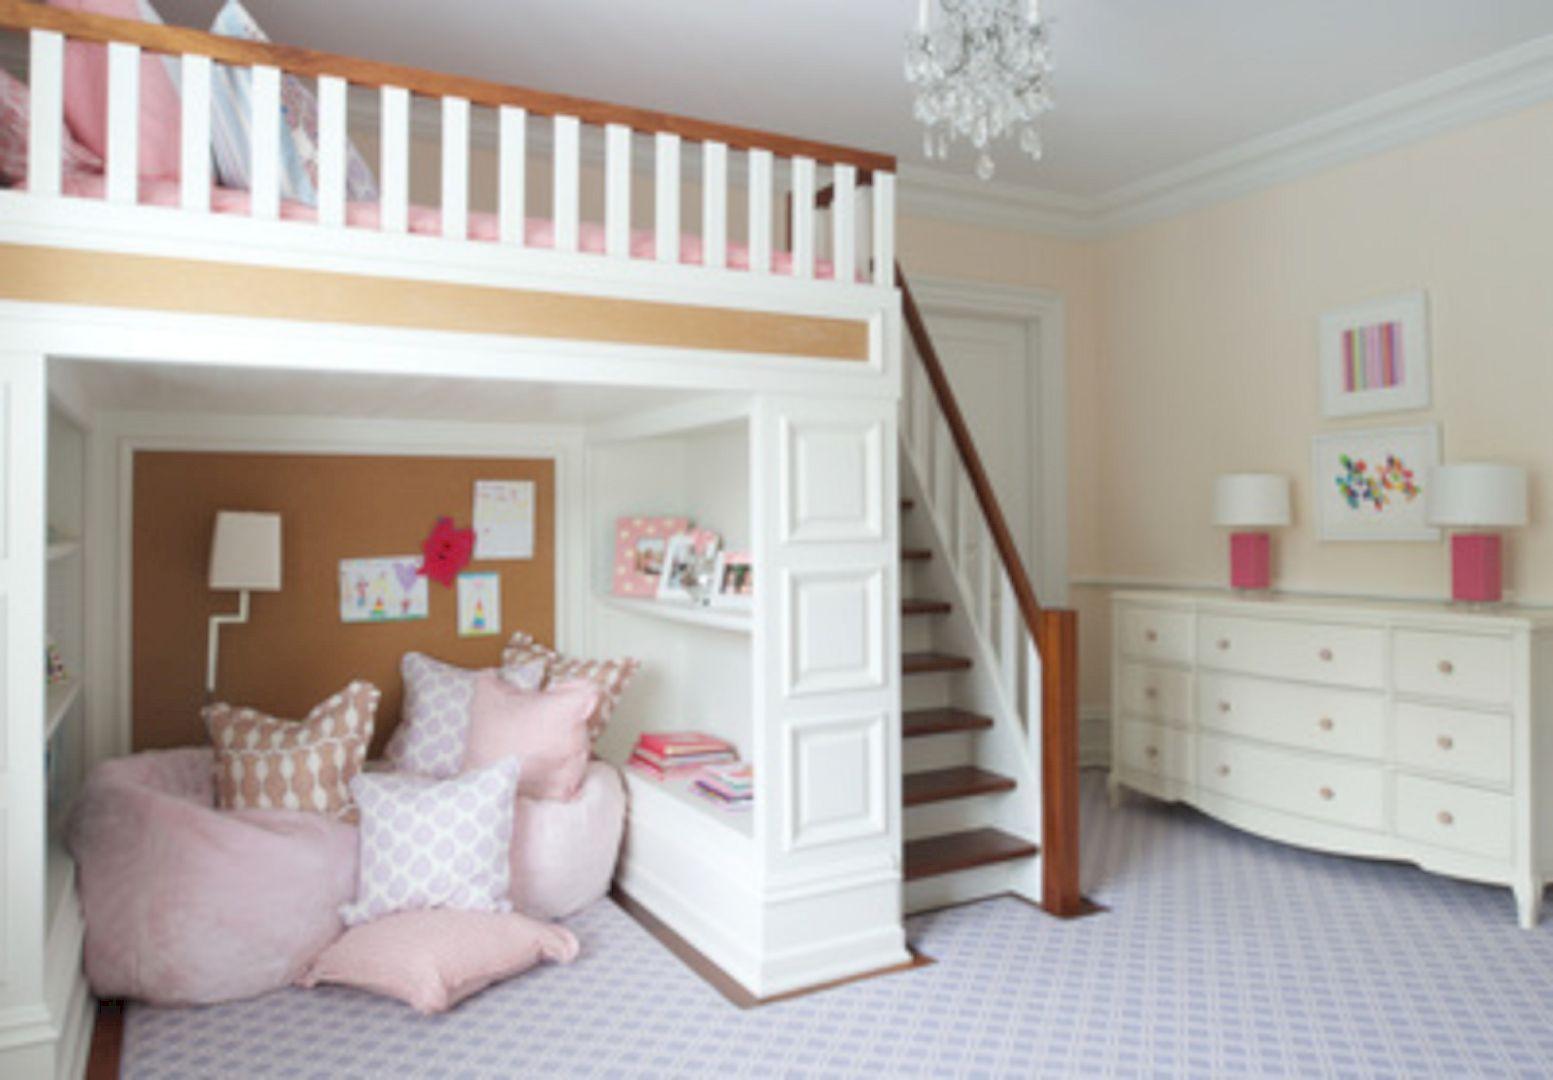 Loft bed boy room ideas   Top Kids Bunk Bed Design Ideas  Furniture  Pinterest  Bunk bed